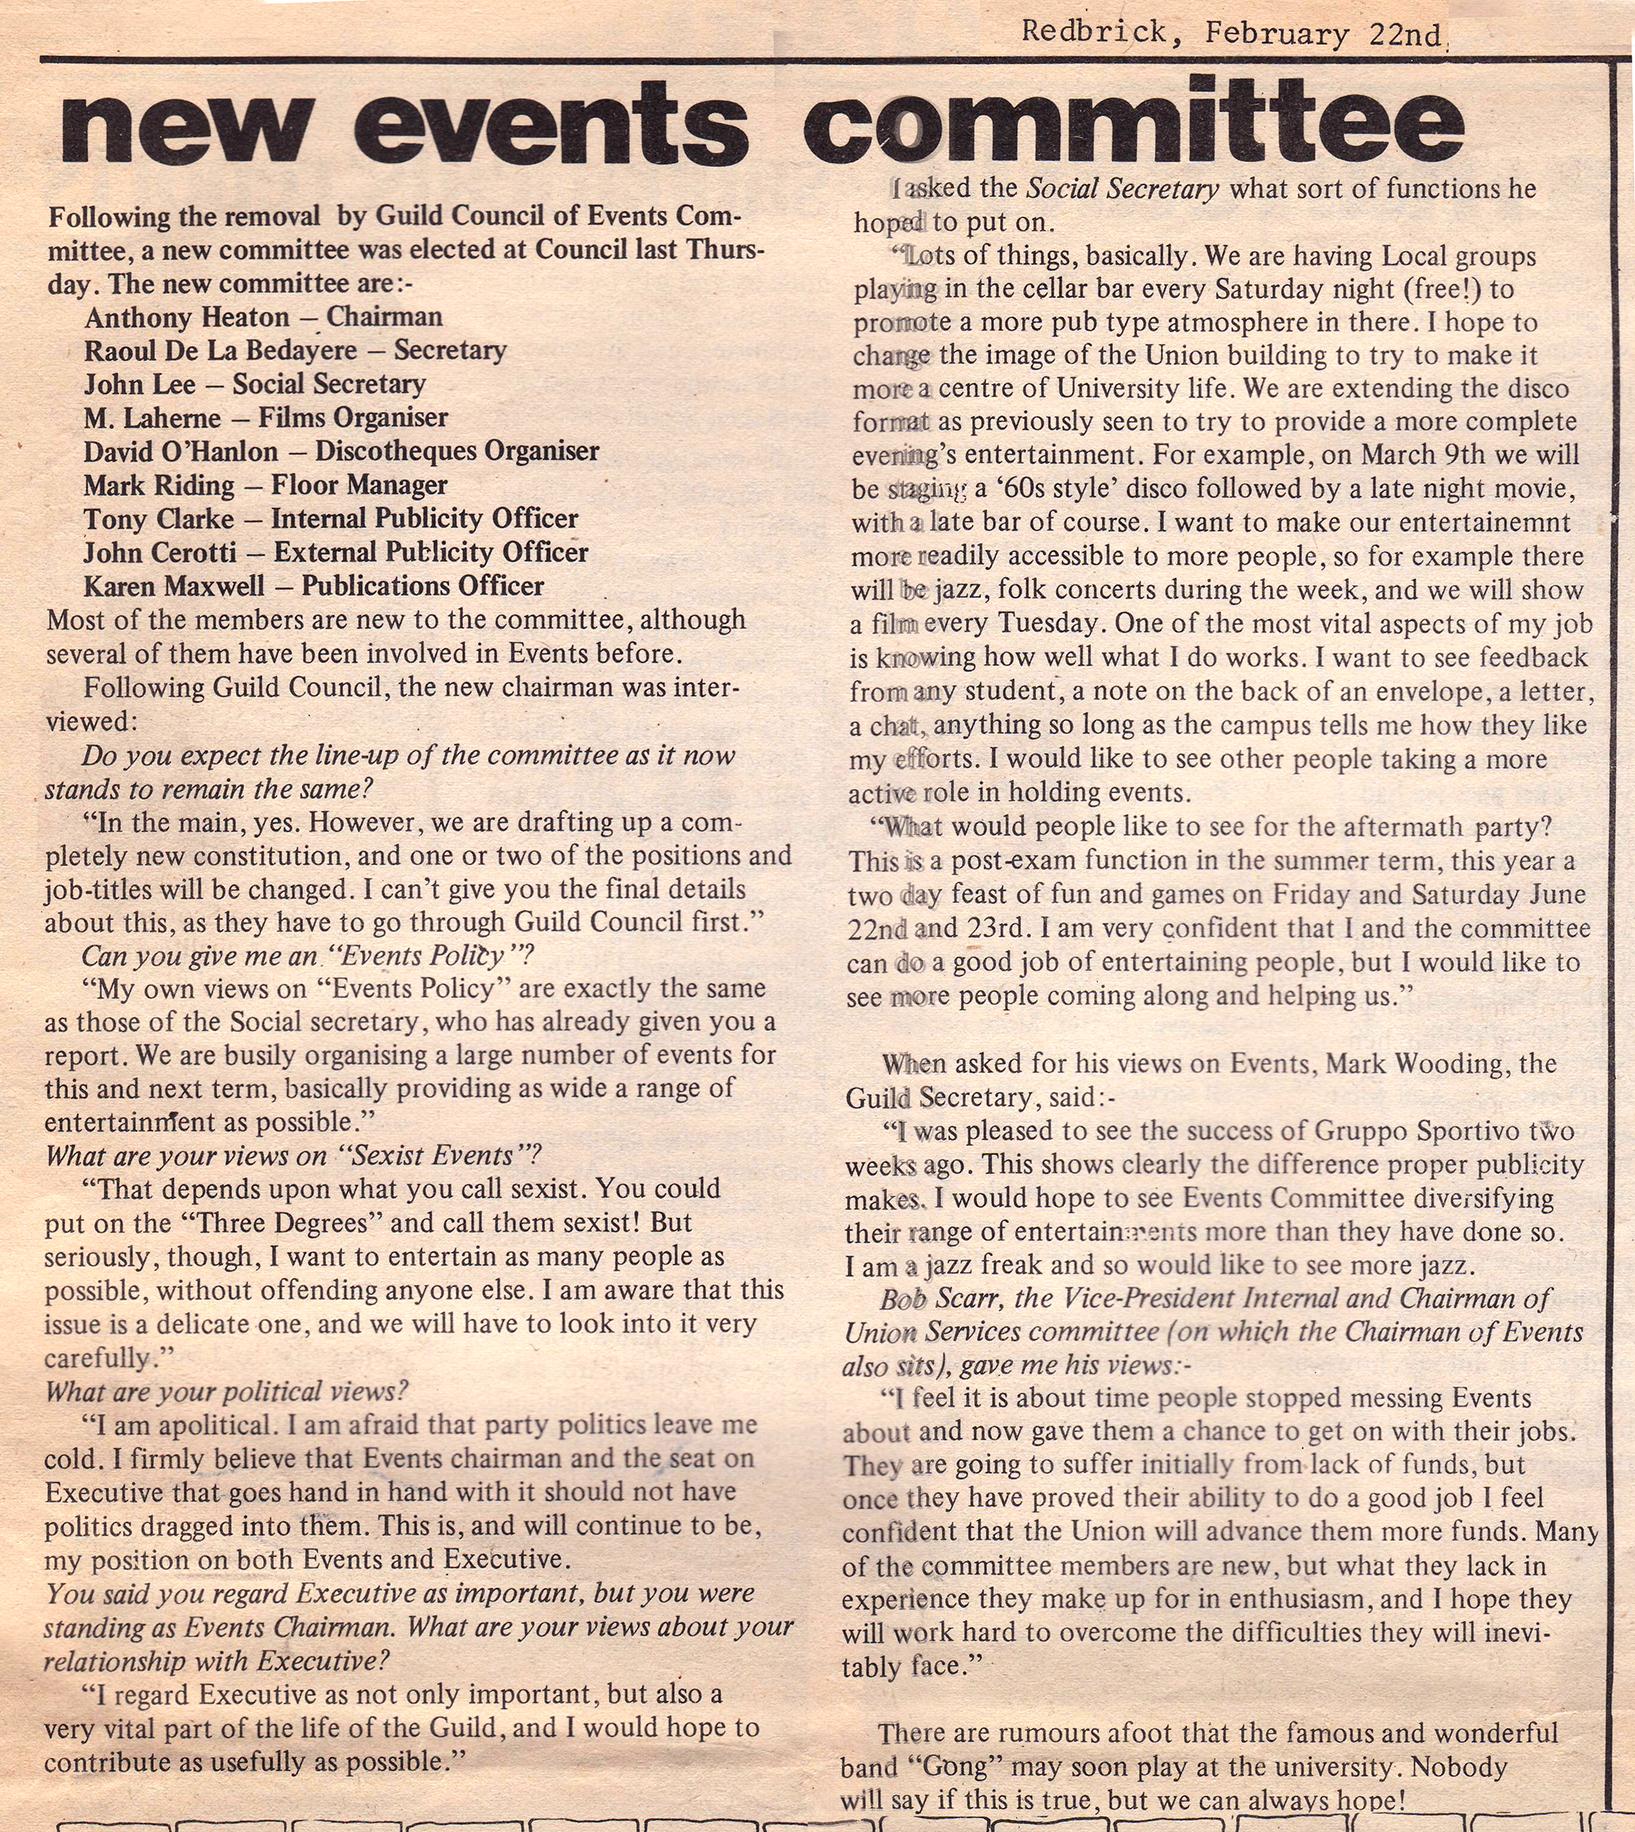 Redbrick21 feb 1979